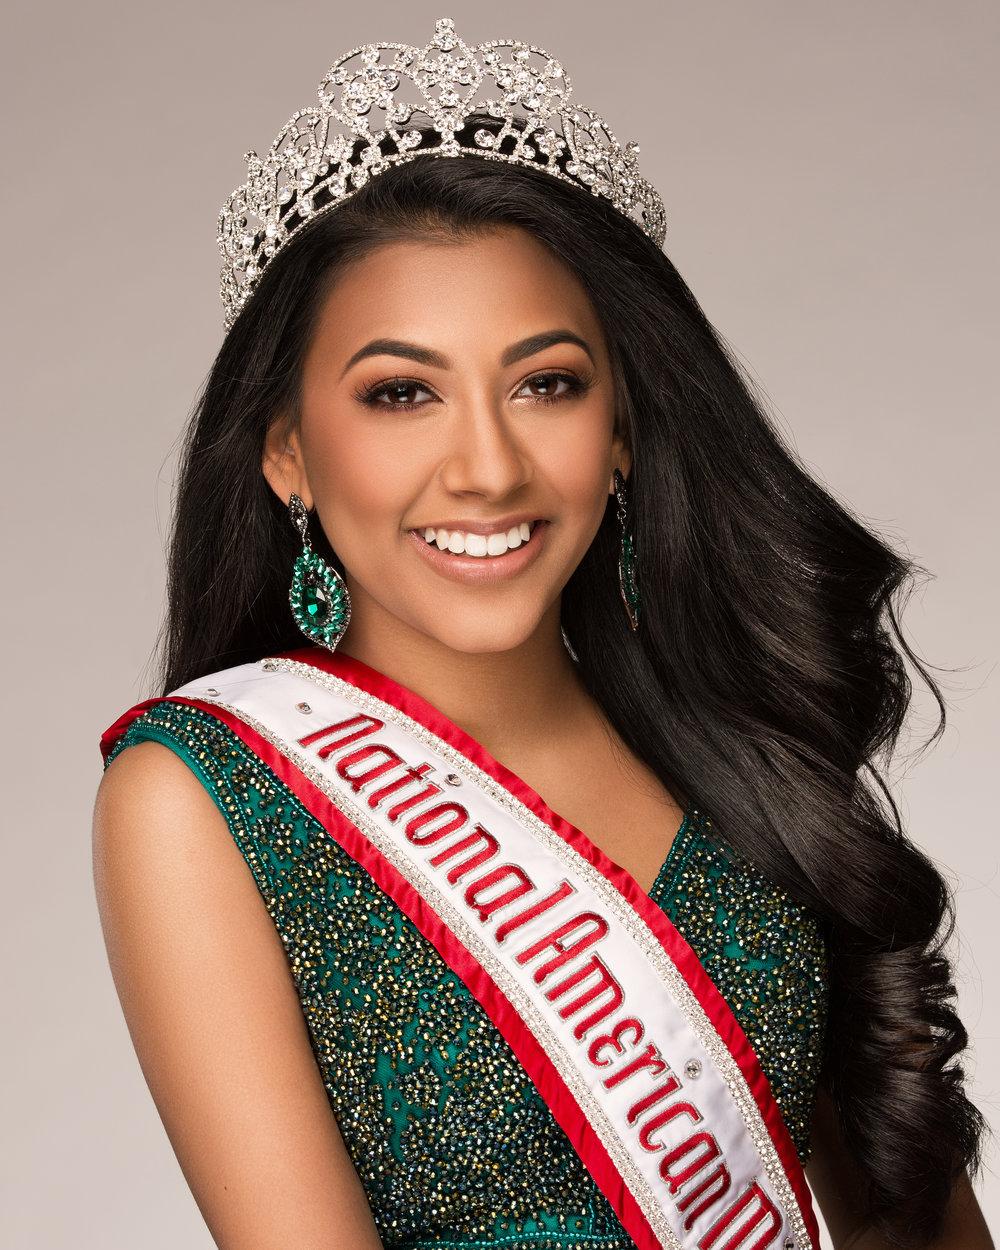 Alyssa - 2019 National American Miss